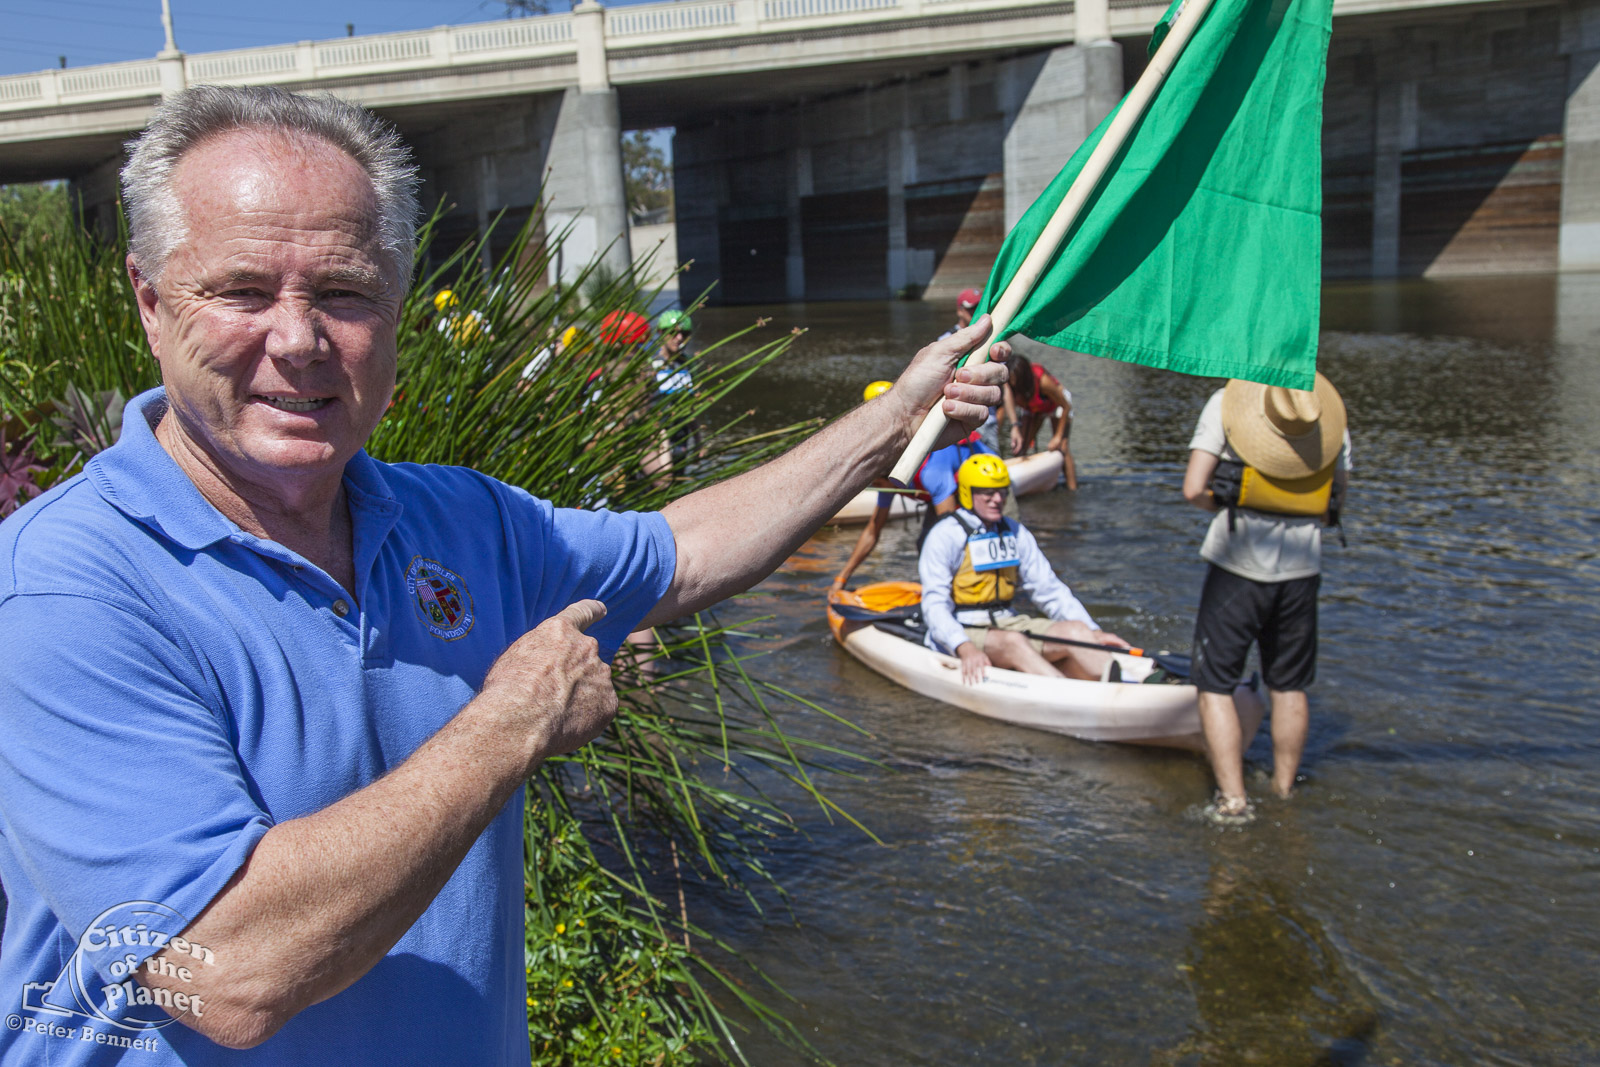 US_CA_48_3864_la_river_boat_race.jpg